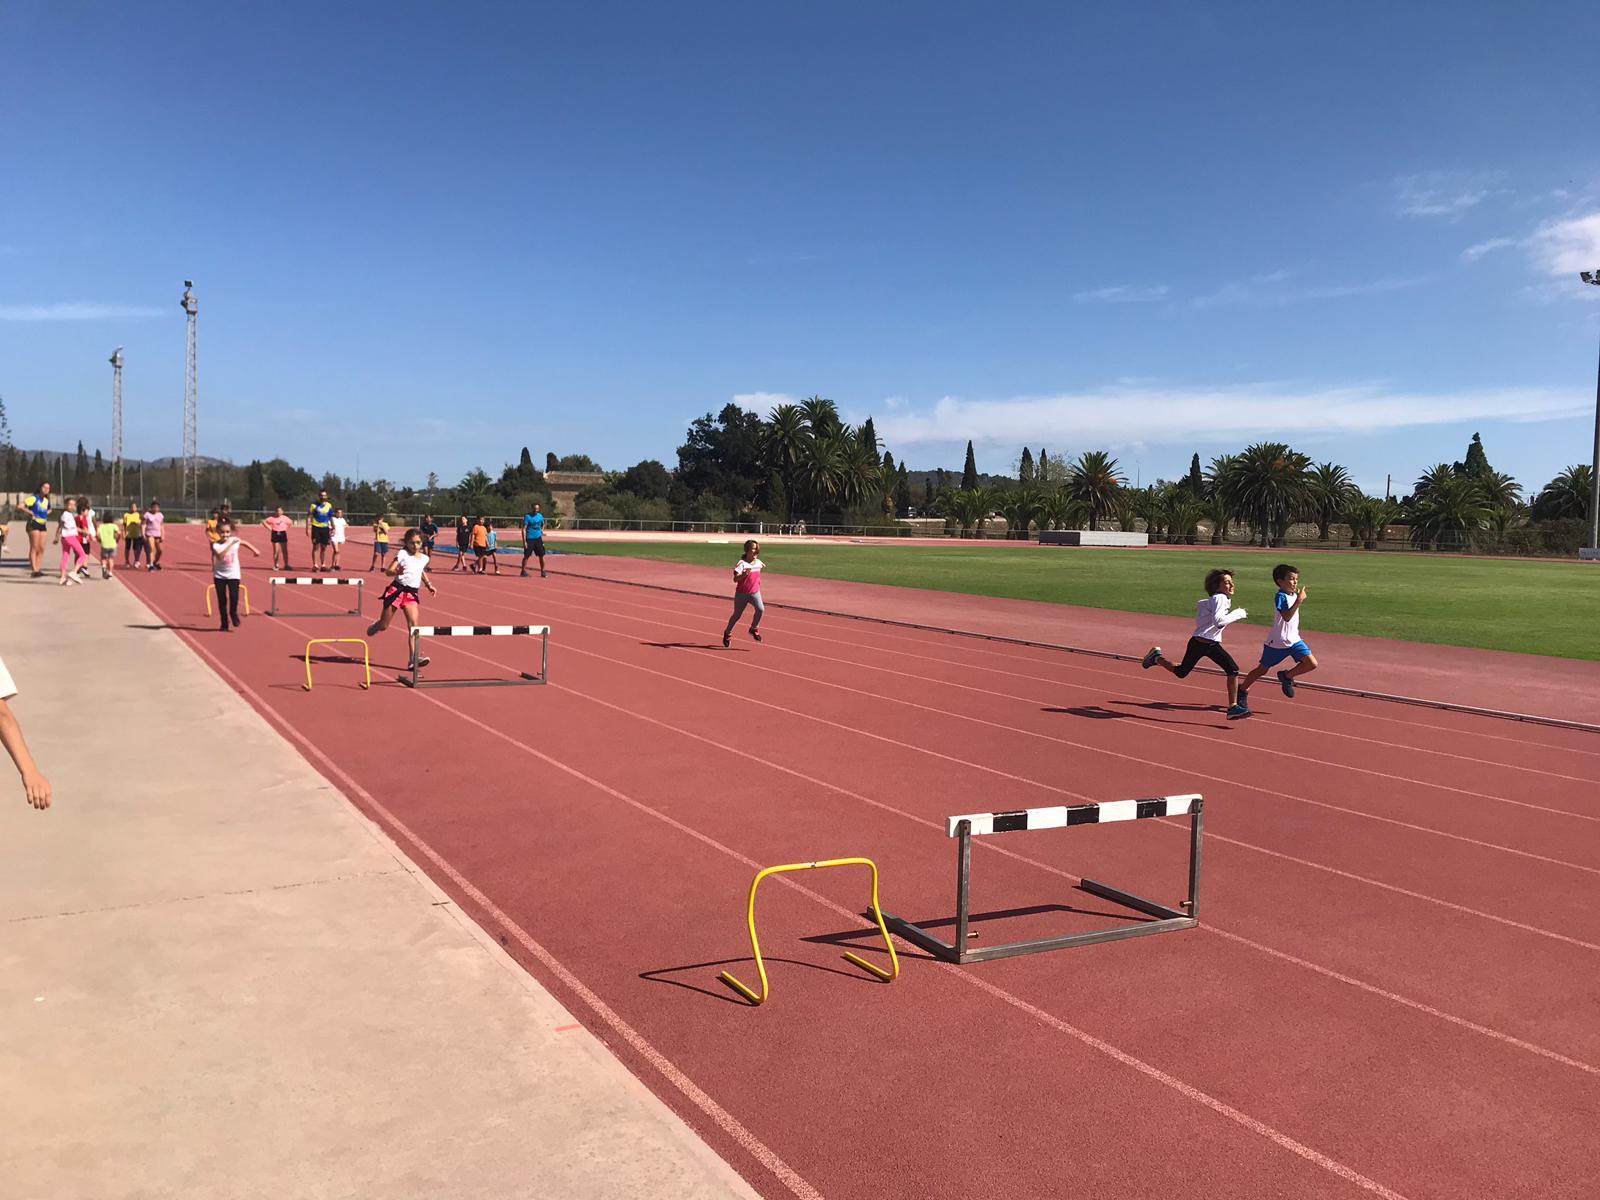 Atletisme a Manacor